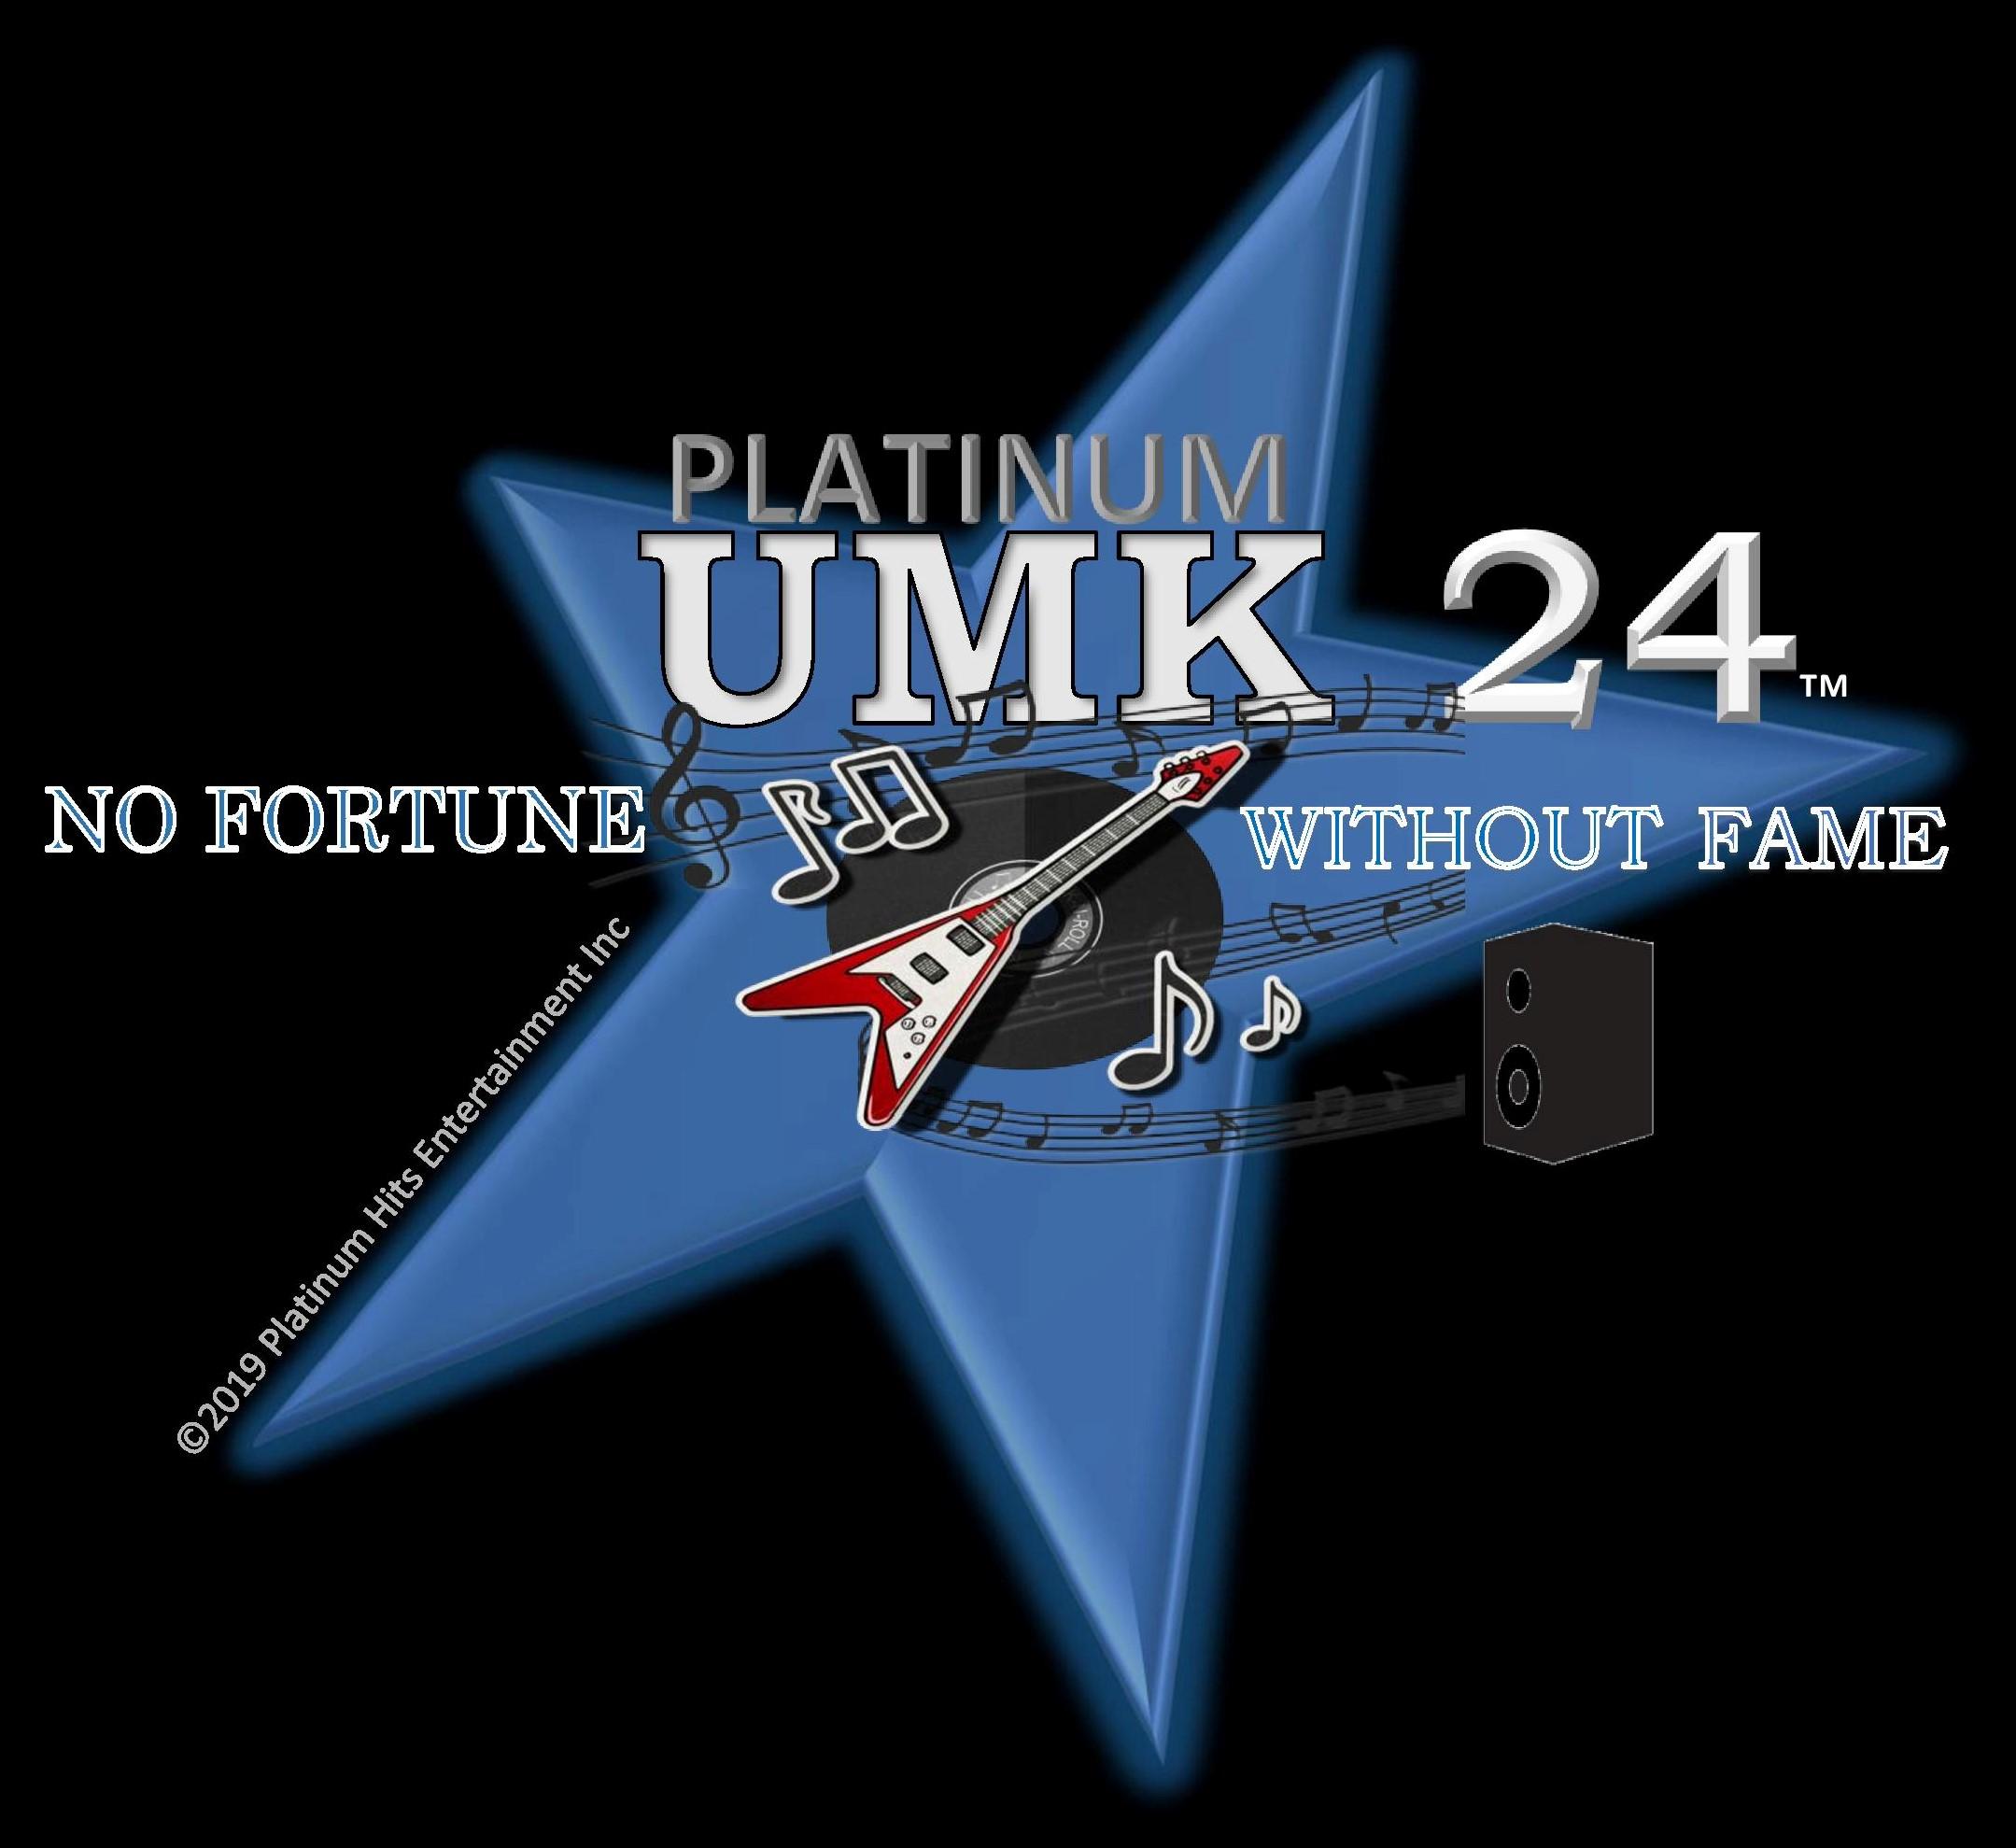 UMK 24 LOGO